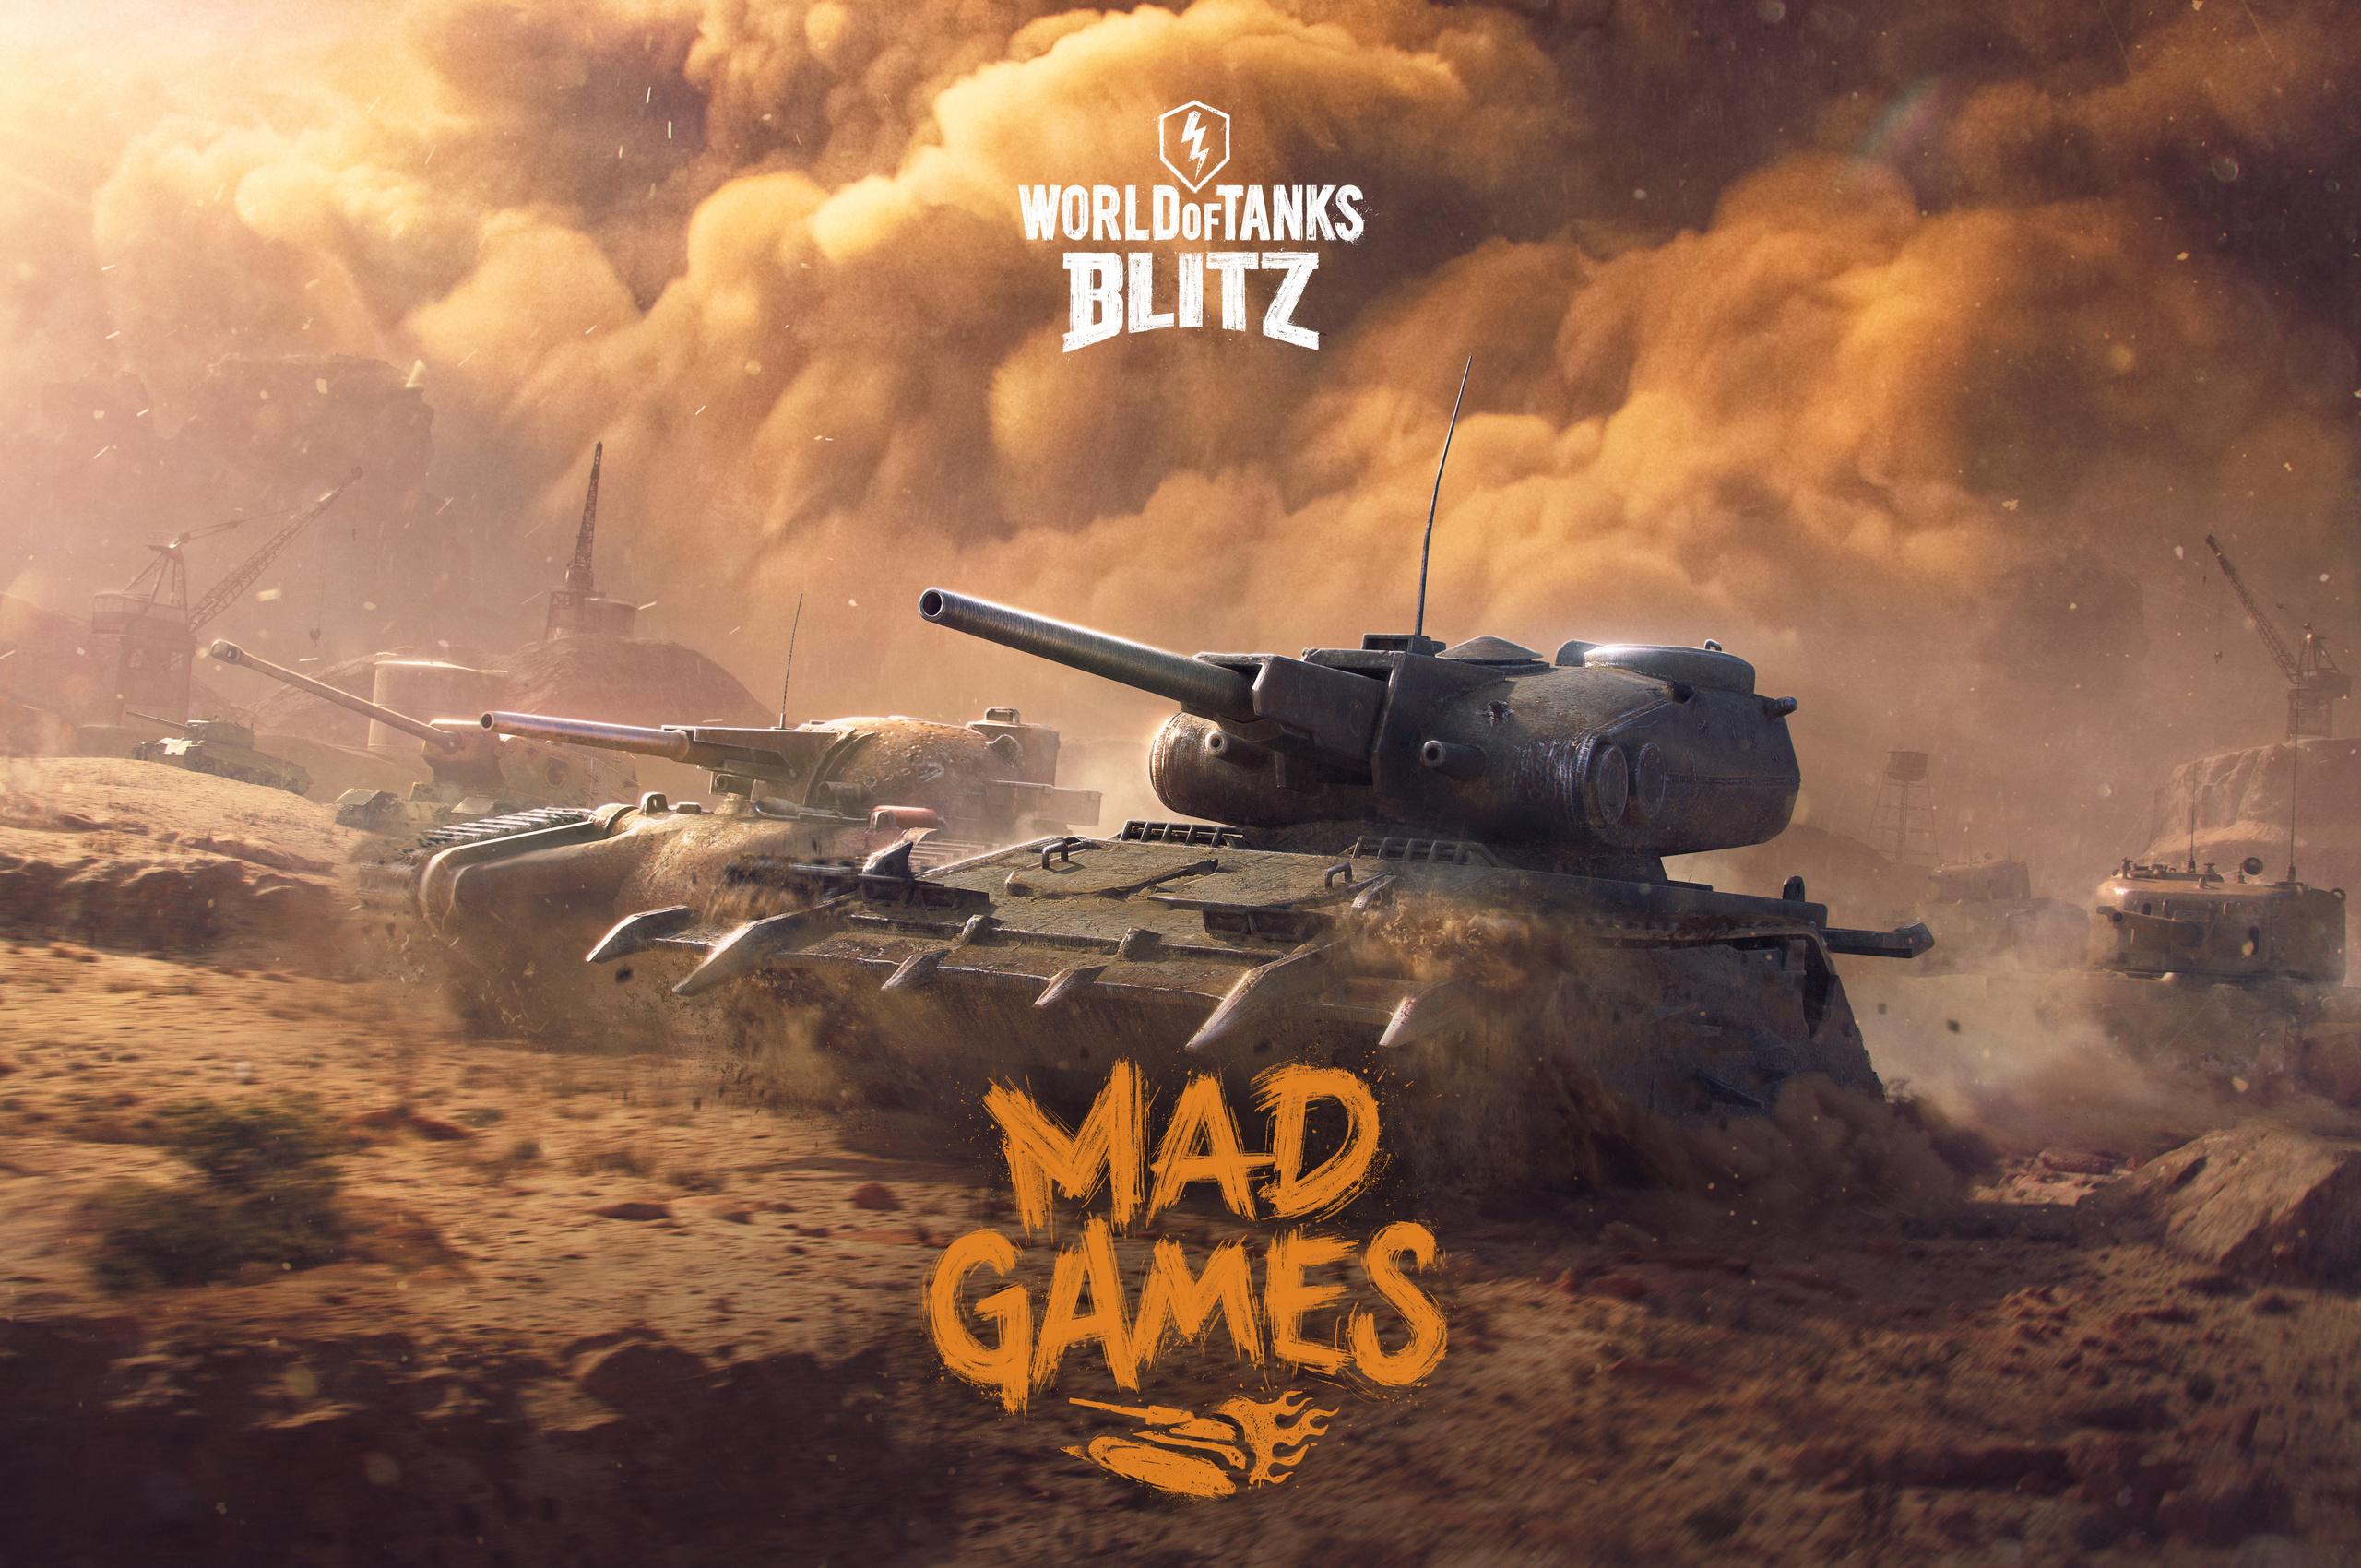 2560x1700 World Of Tanks Blitz Mad Games 2018 5k Chromebook Pixel